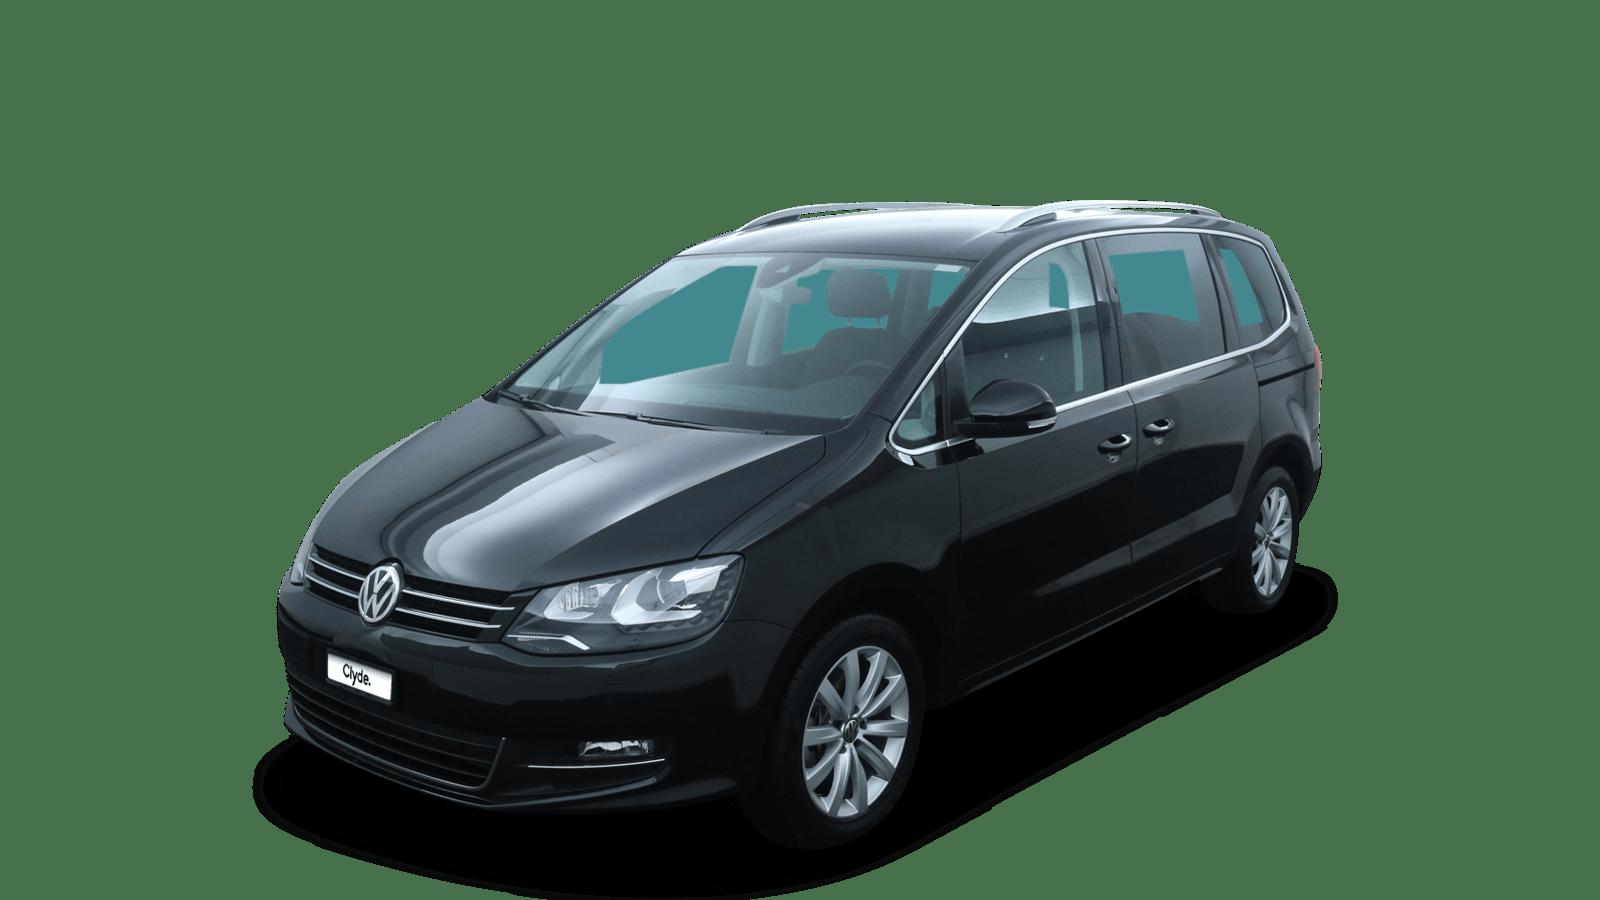 VW Sharan Schwarz front - Clyde Auto-Abo